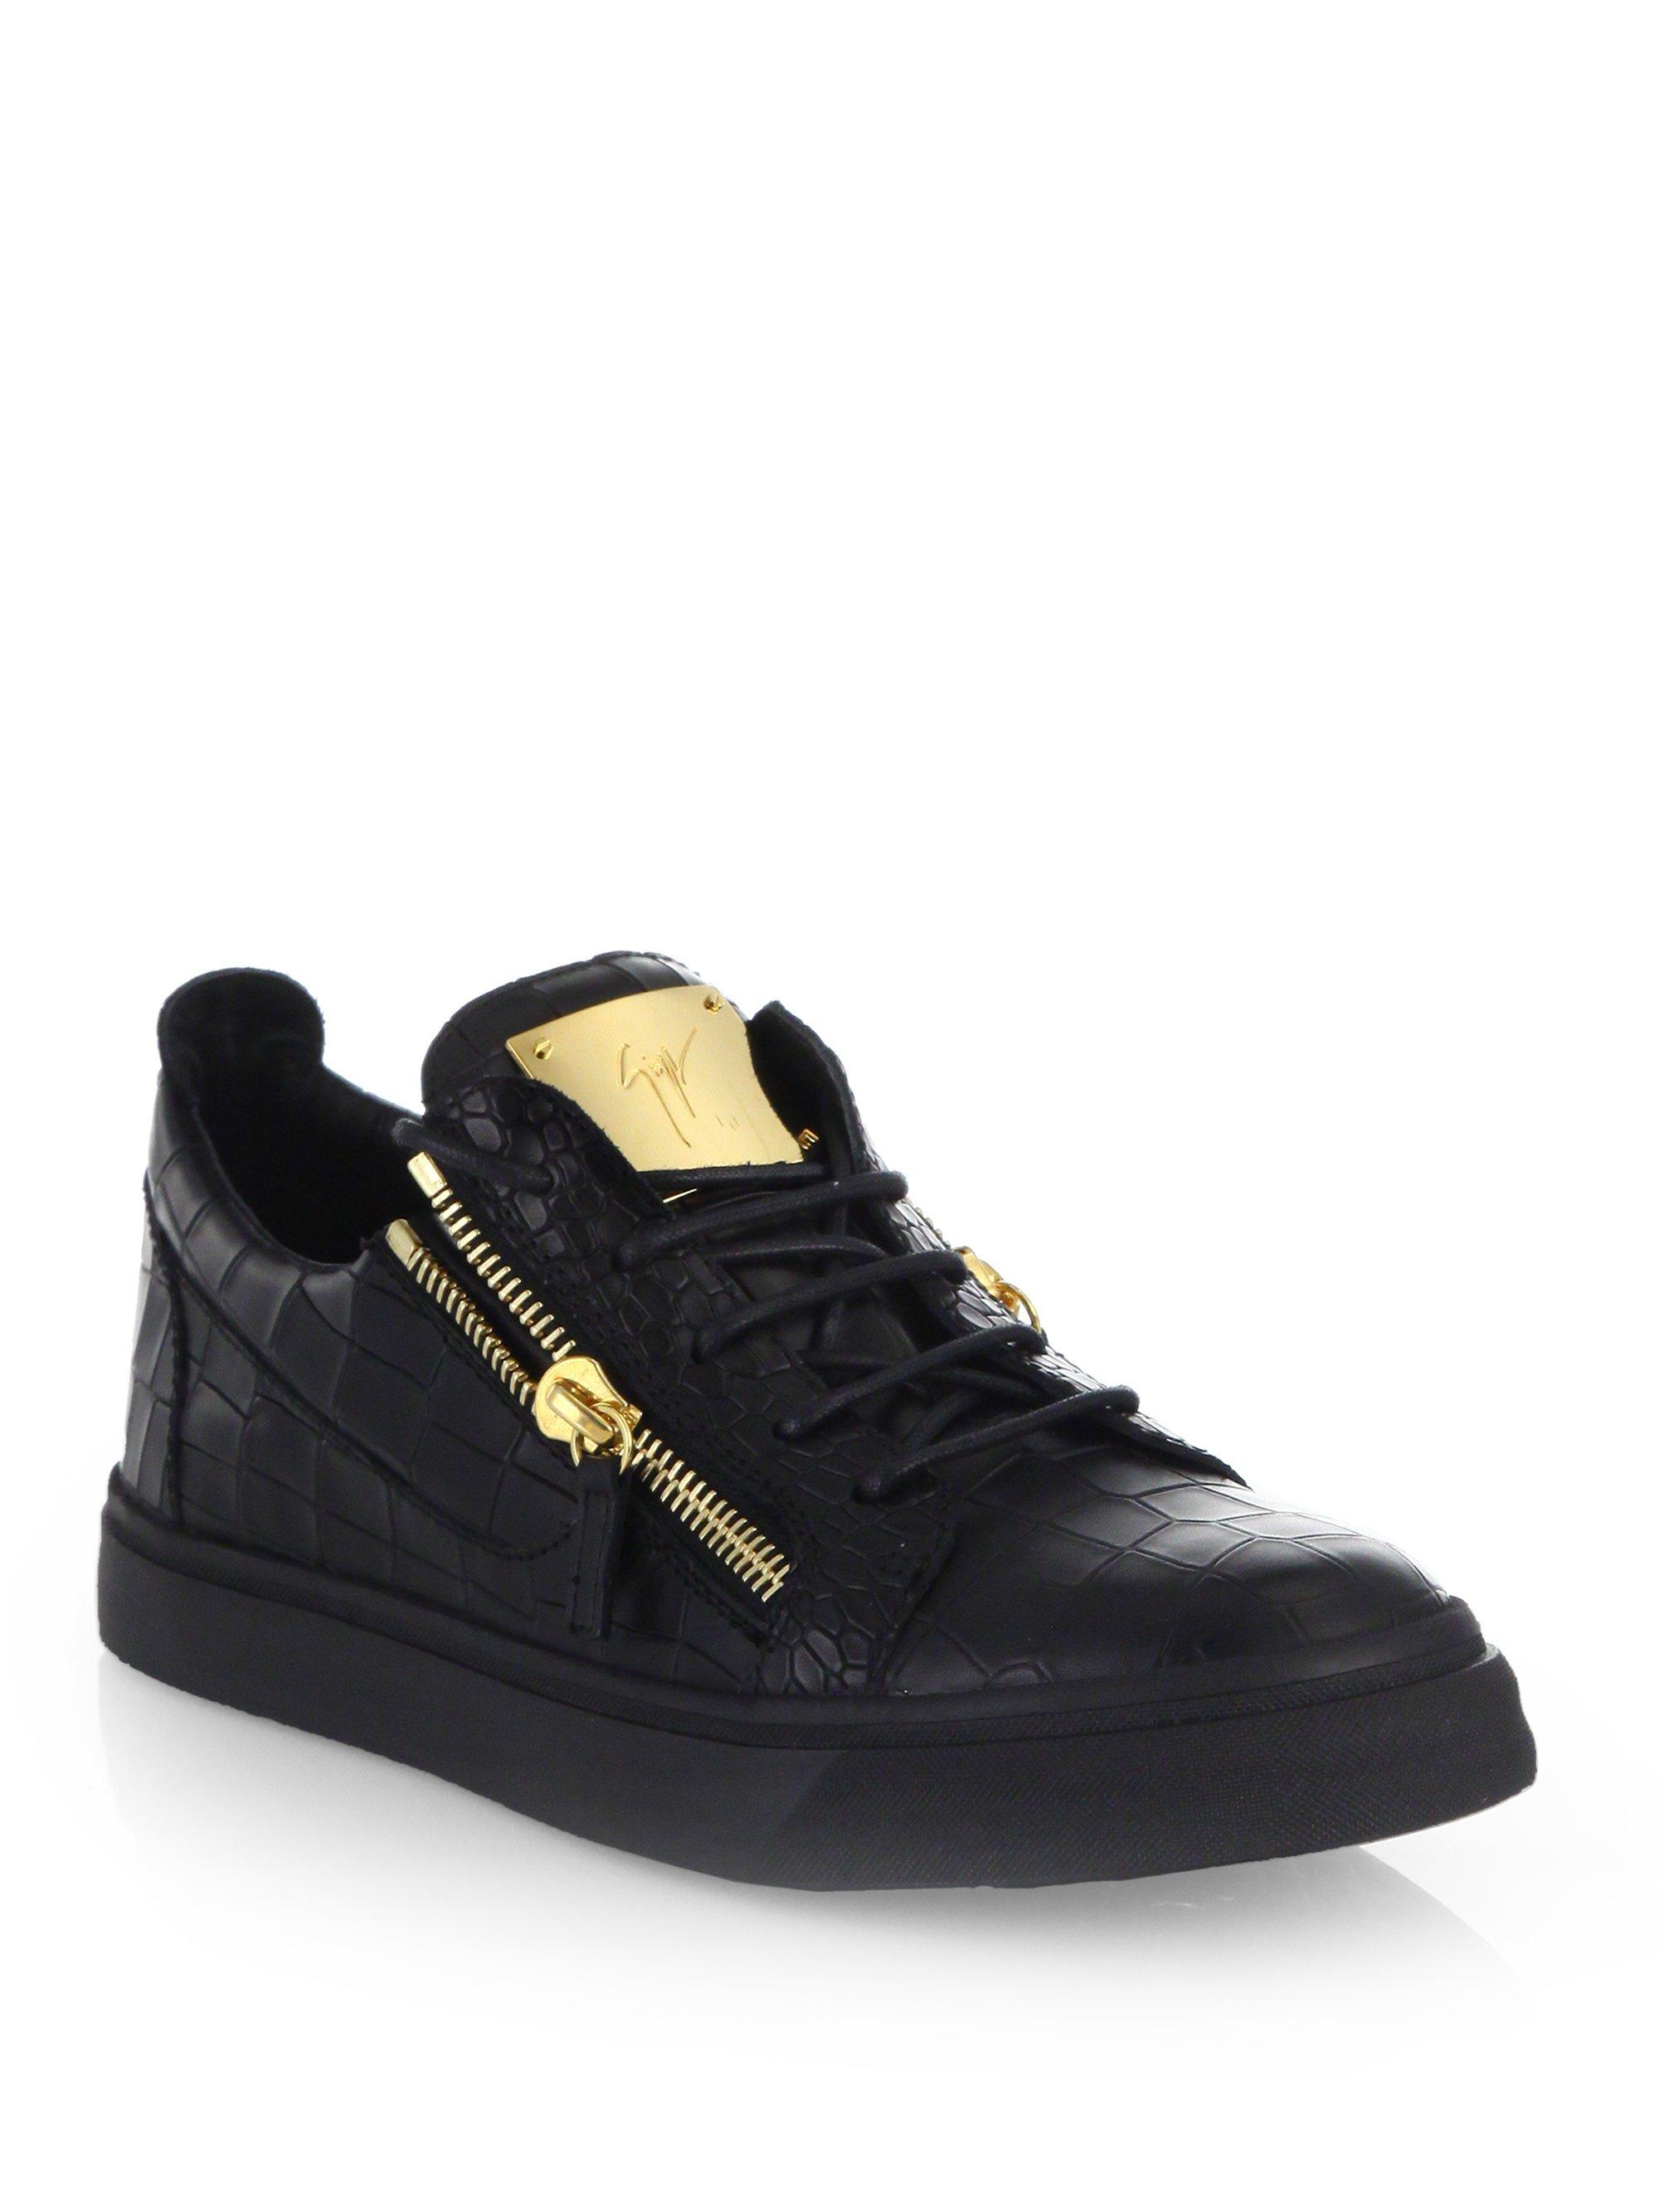 Mens Giuseppe Shoes Sale